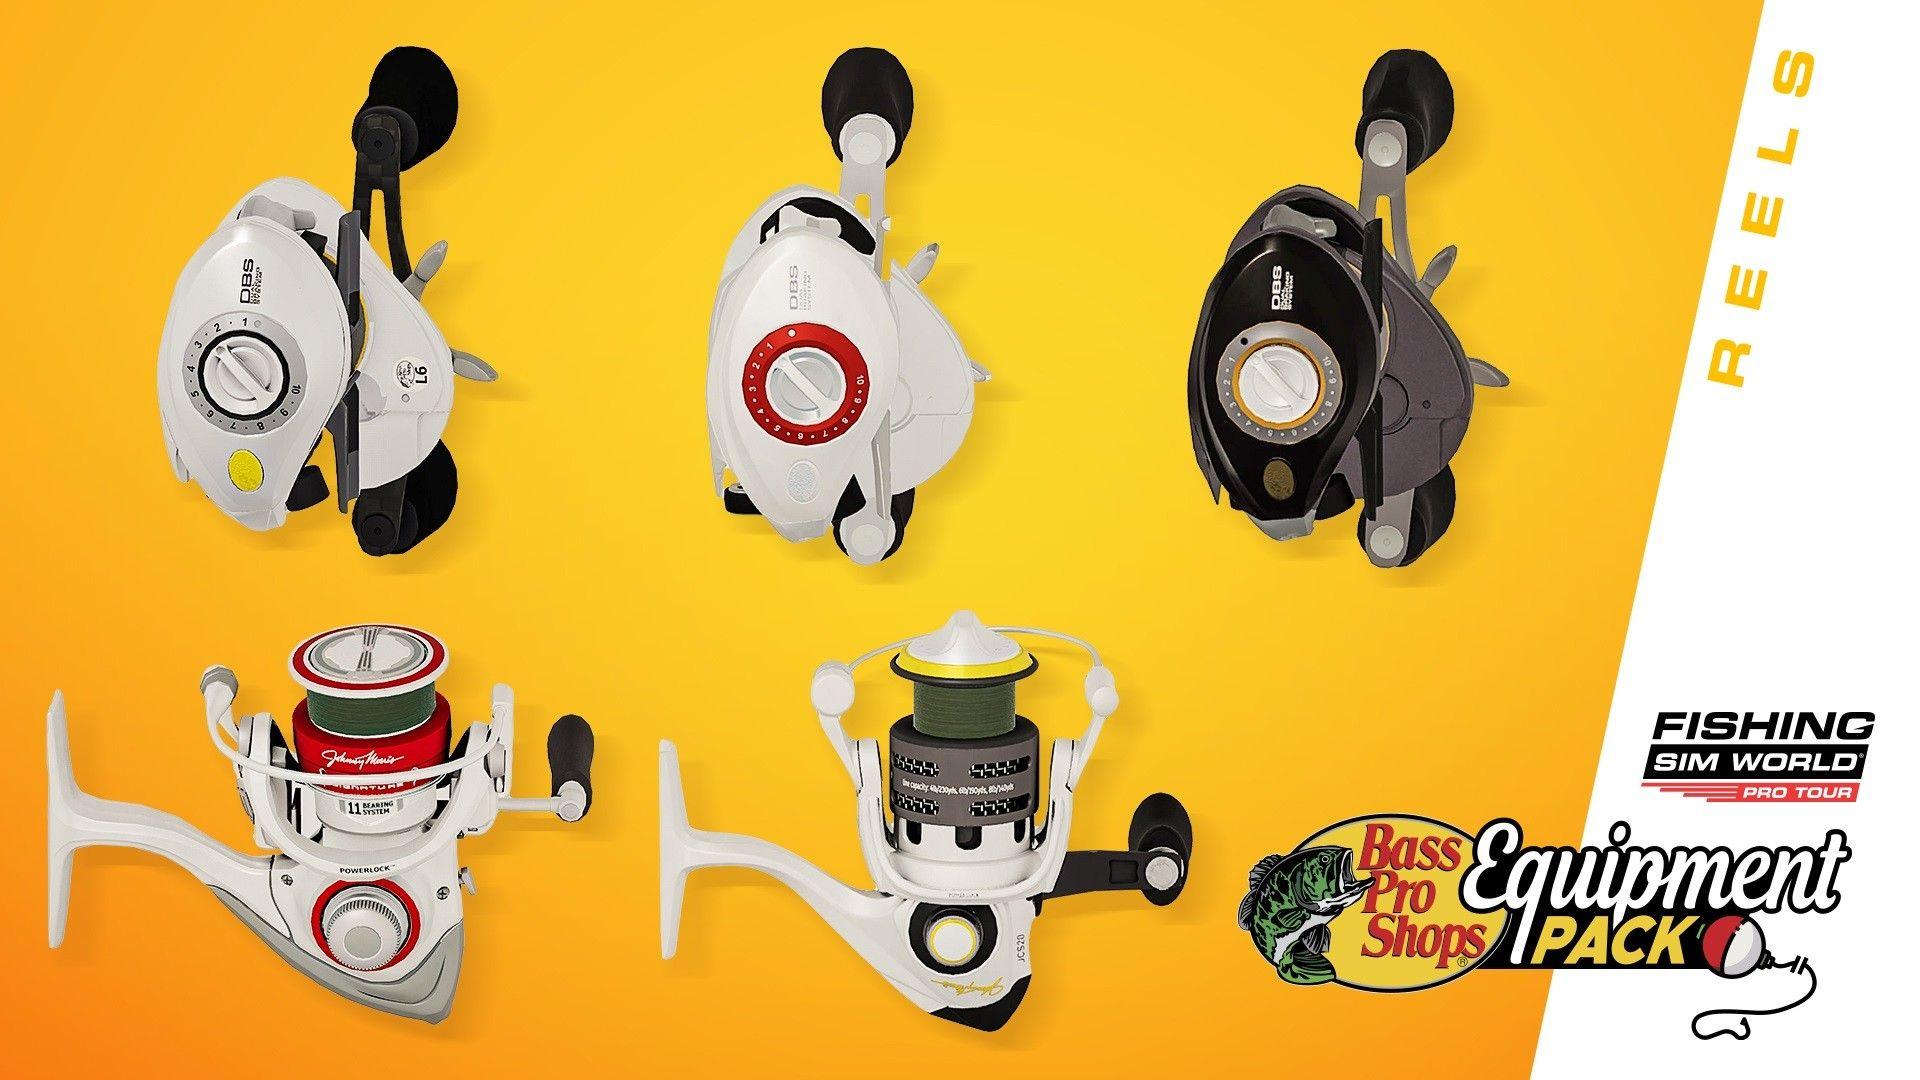 Fishing Sim World: Pro Tour - Bass Pro Shops Equipment Pack